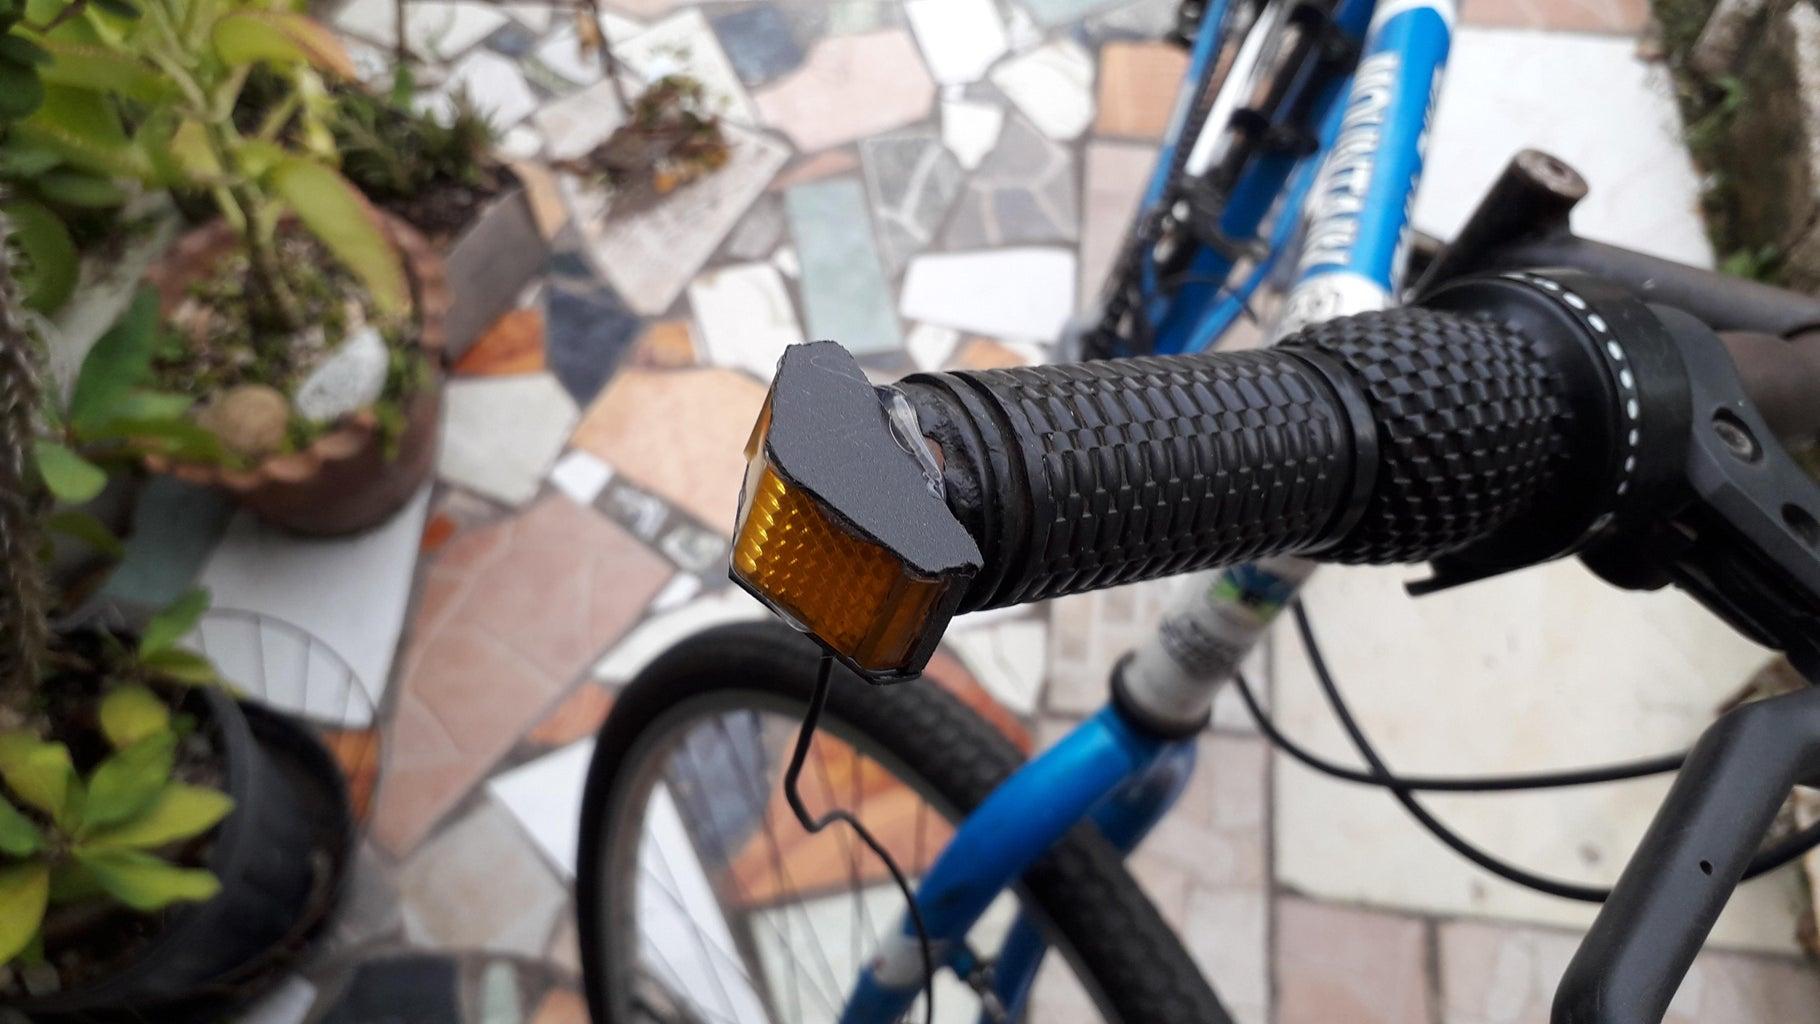 Install Light to Handle Bar